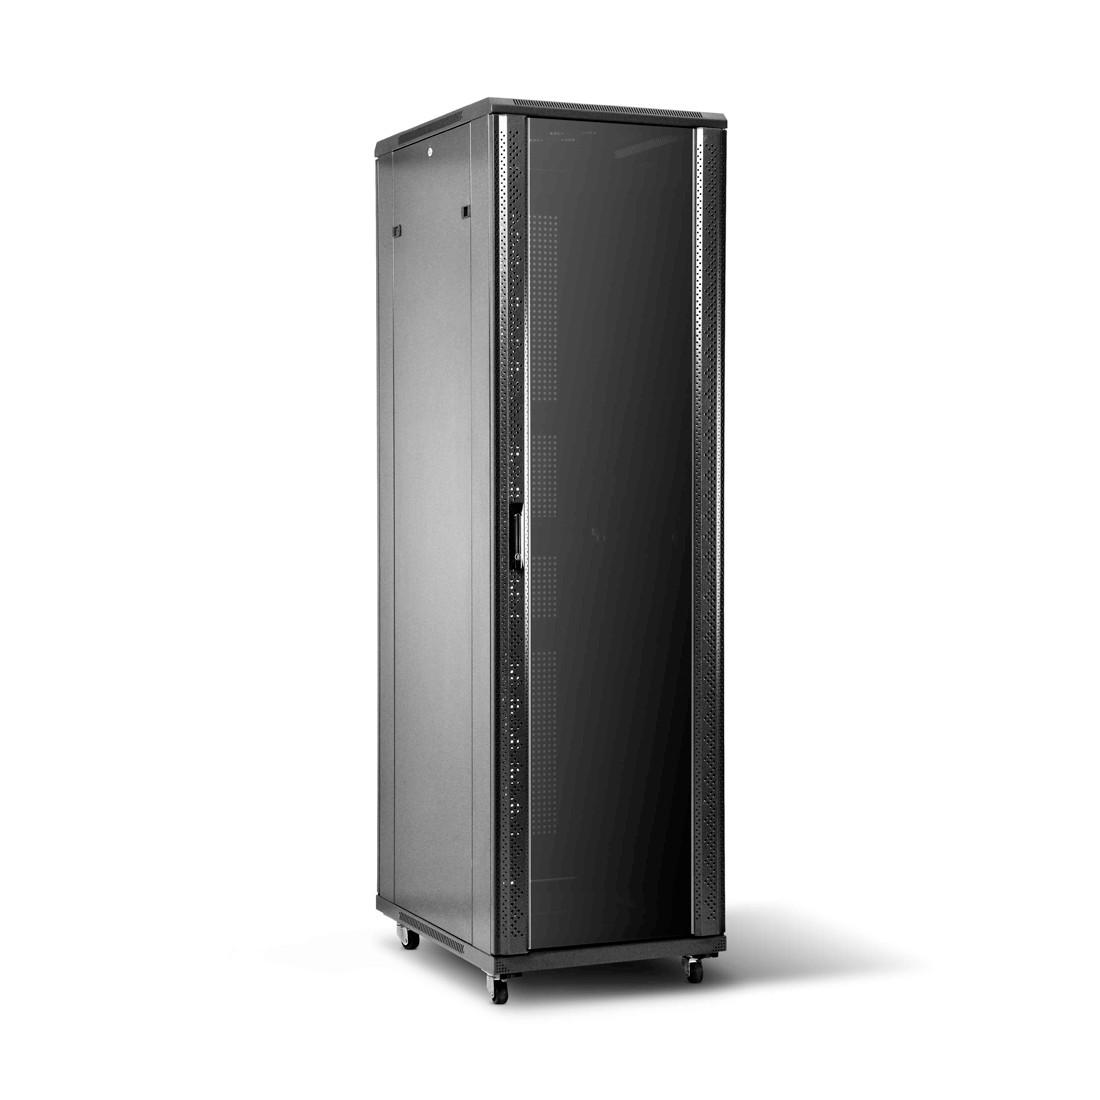 Шкаф серверный SHIP 601S.6624.24.100 24U 600*600*1200 мм